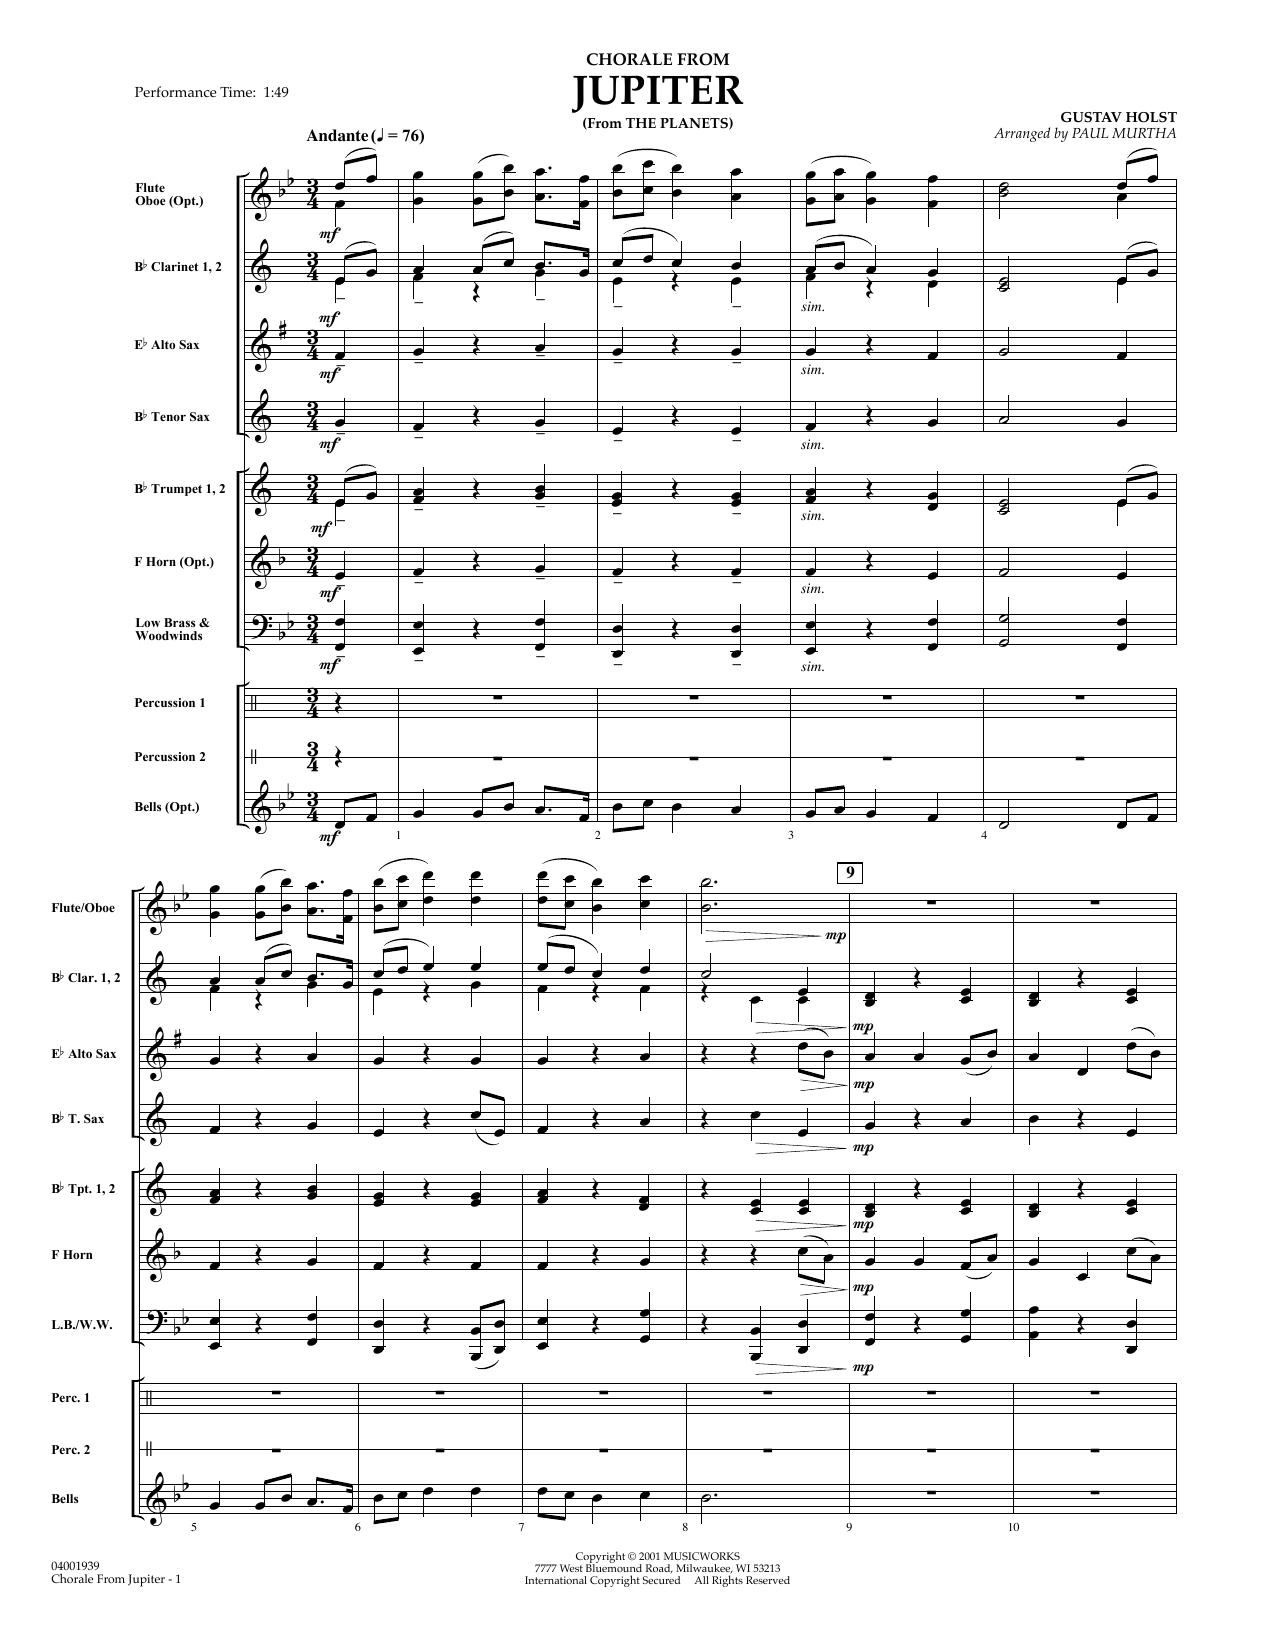 Chorale from Jupiter (COMPLETE) sheet music for concert band by Gustav Holst